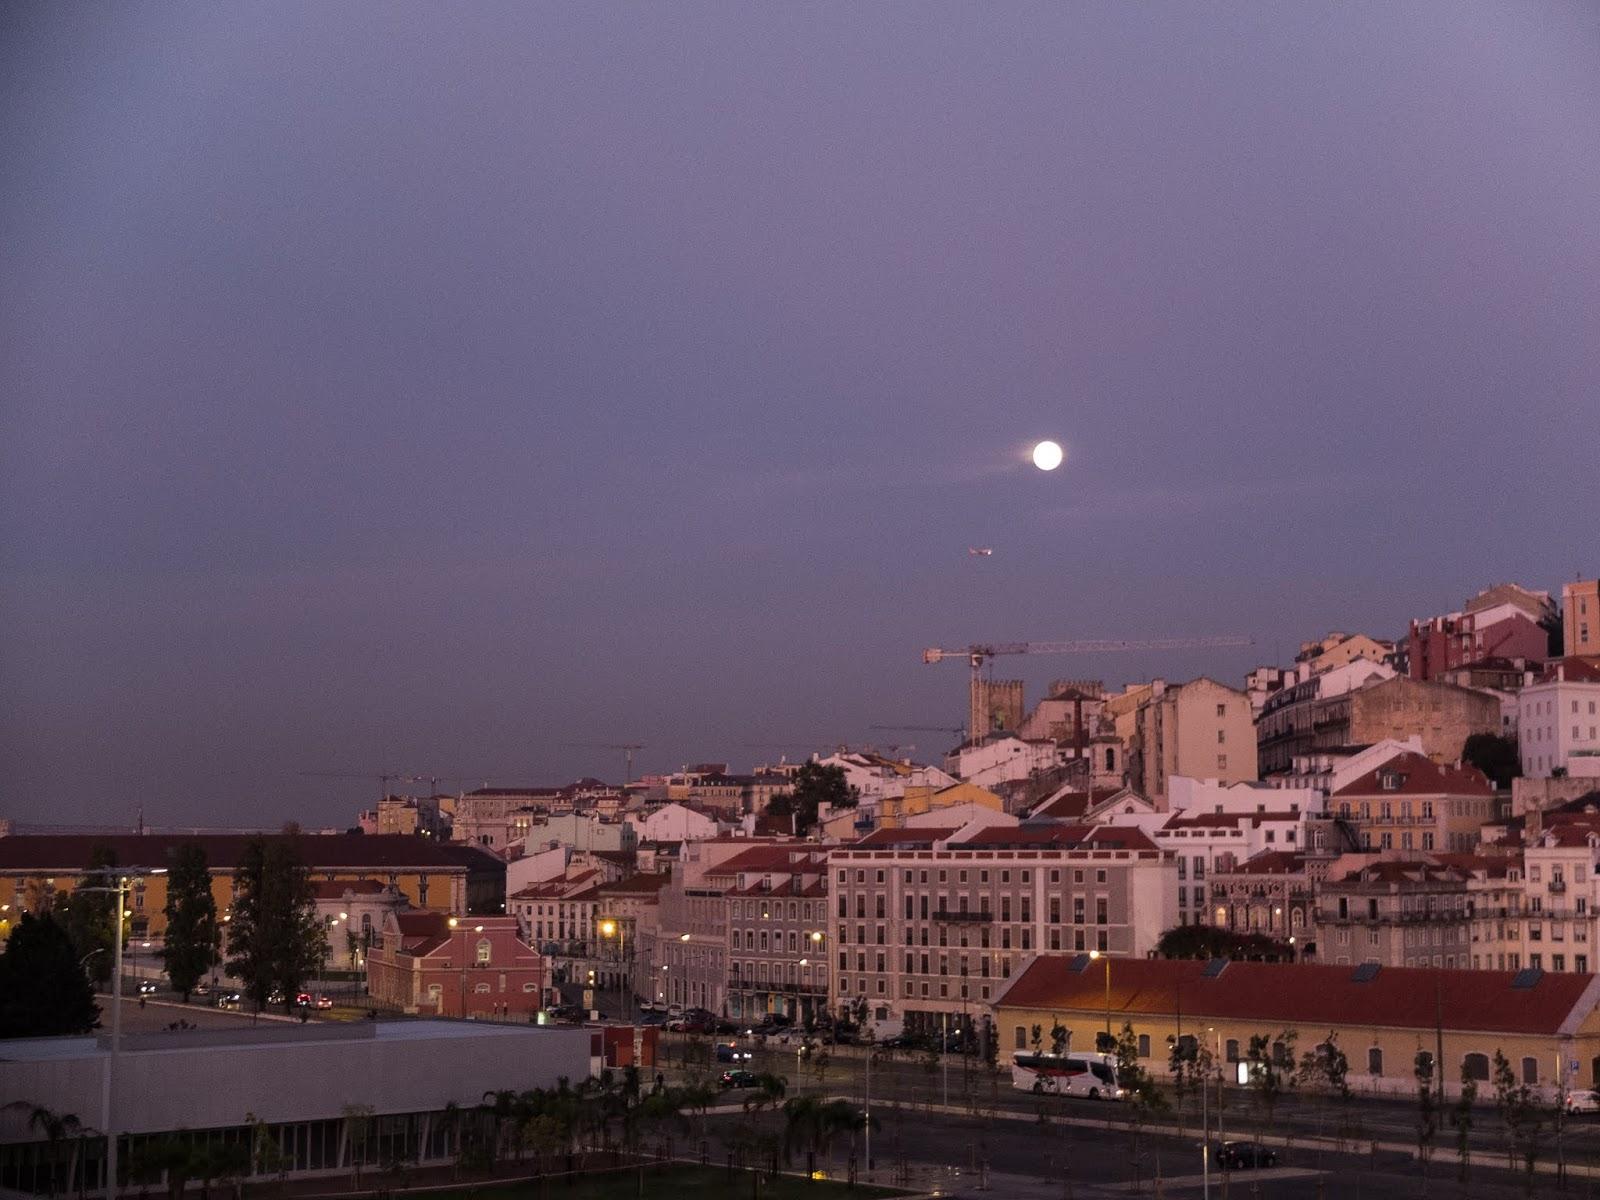 Moon glowing above Lisbon at dawn.